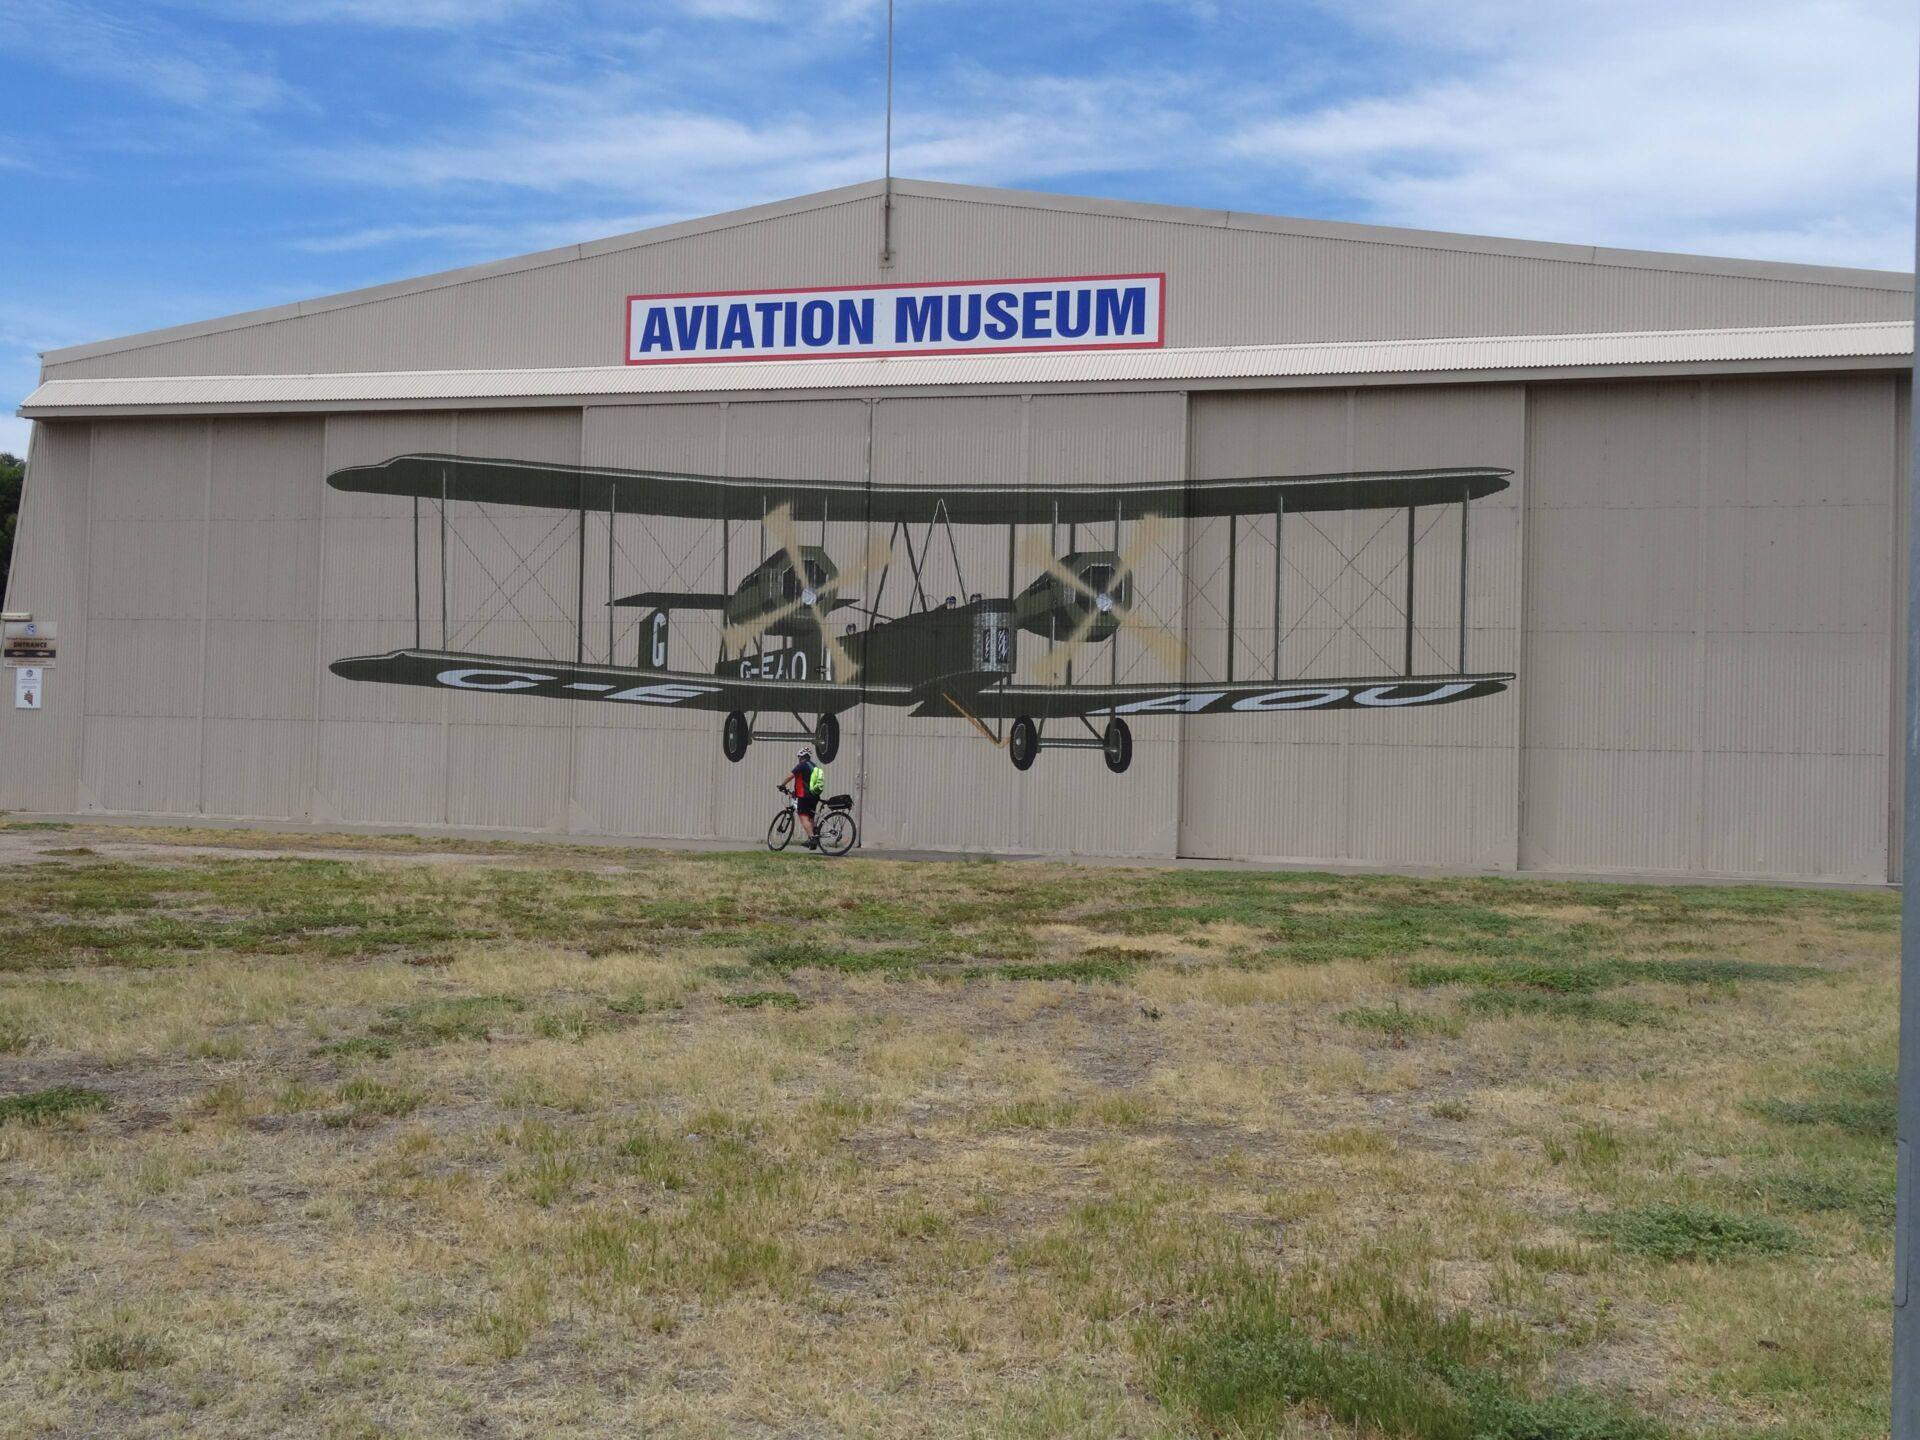 Aviation Museum, Lipson St Port Adelaide